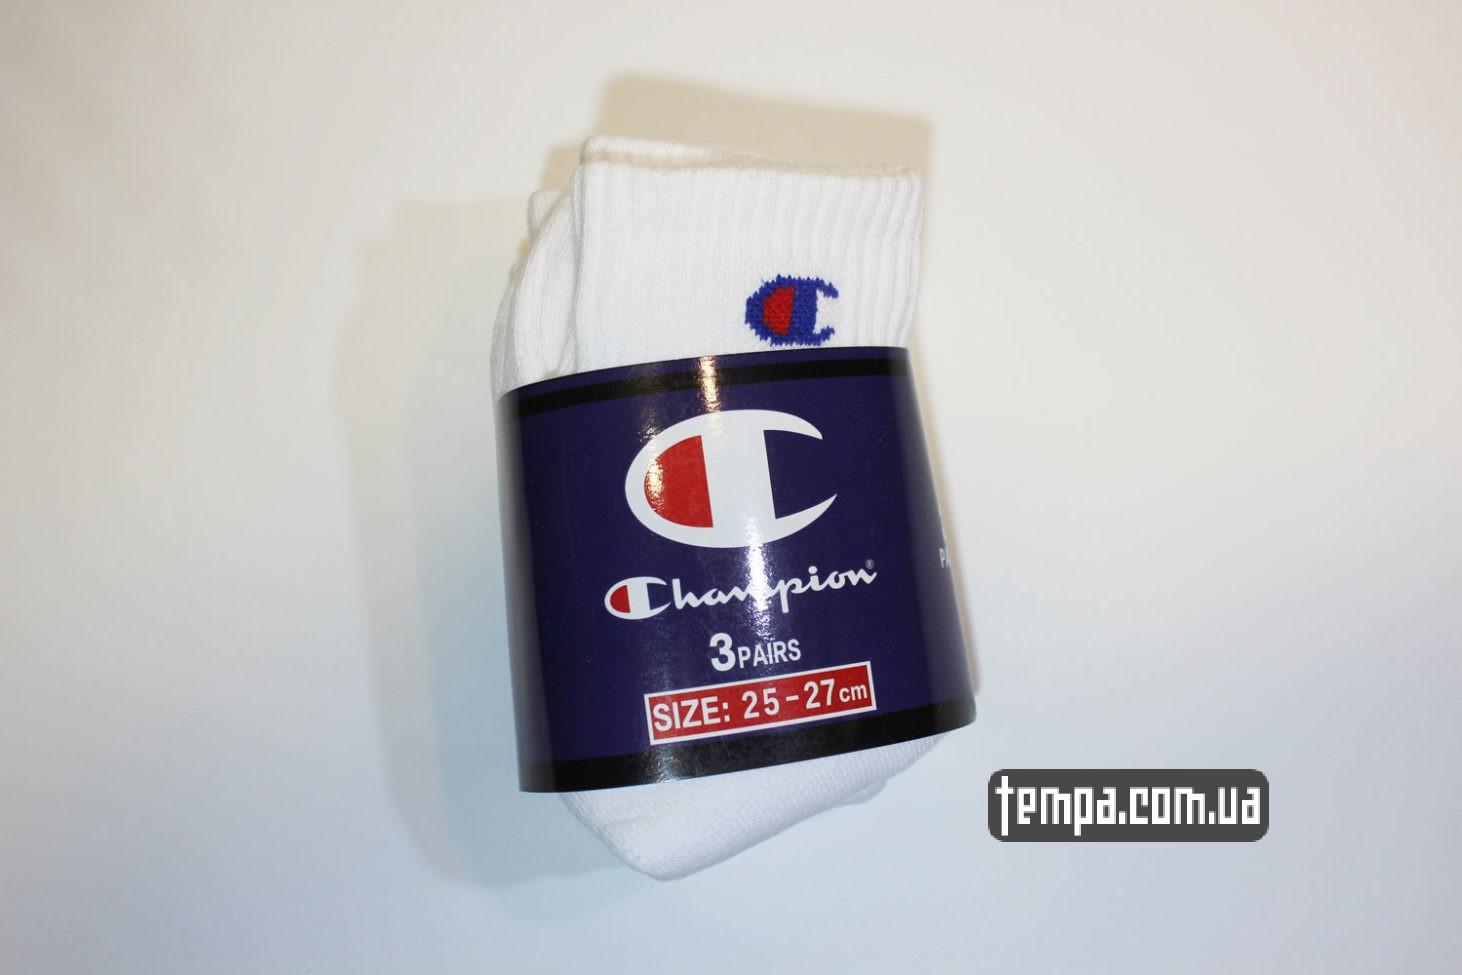 чемпион носки купить носки champion средние белые tube socks white